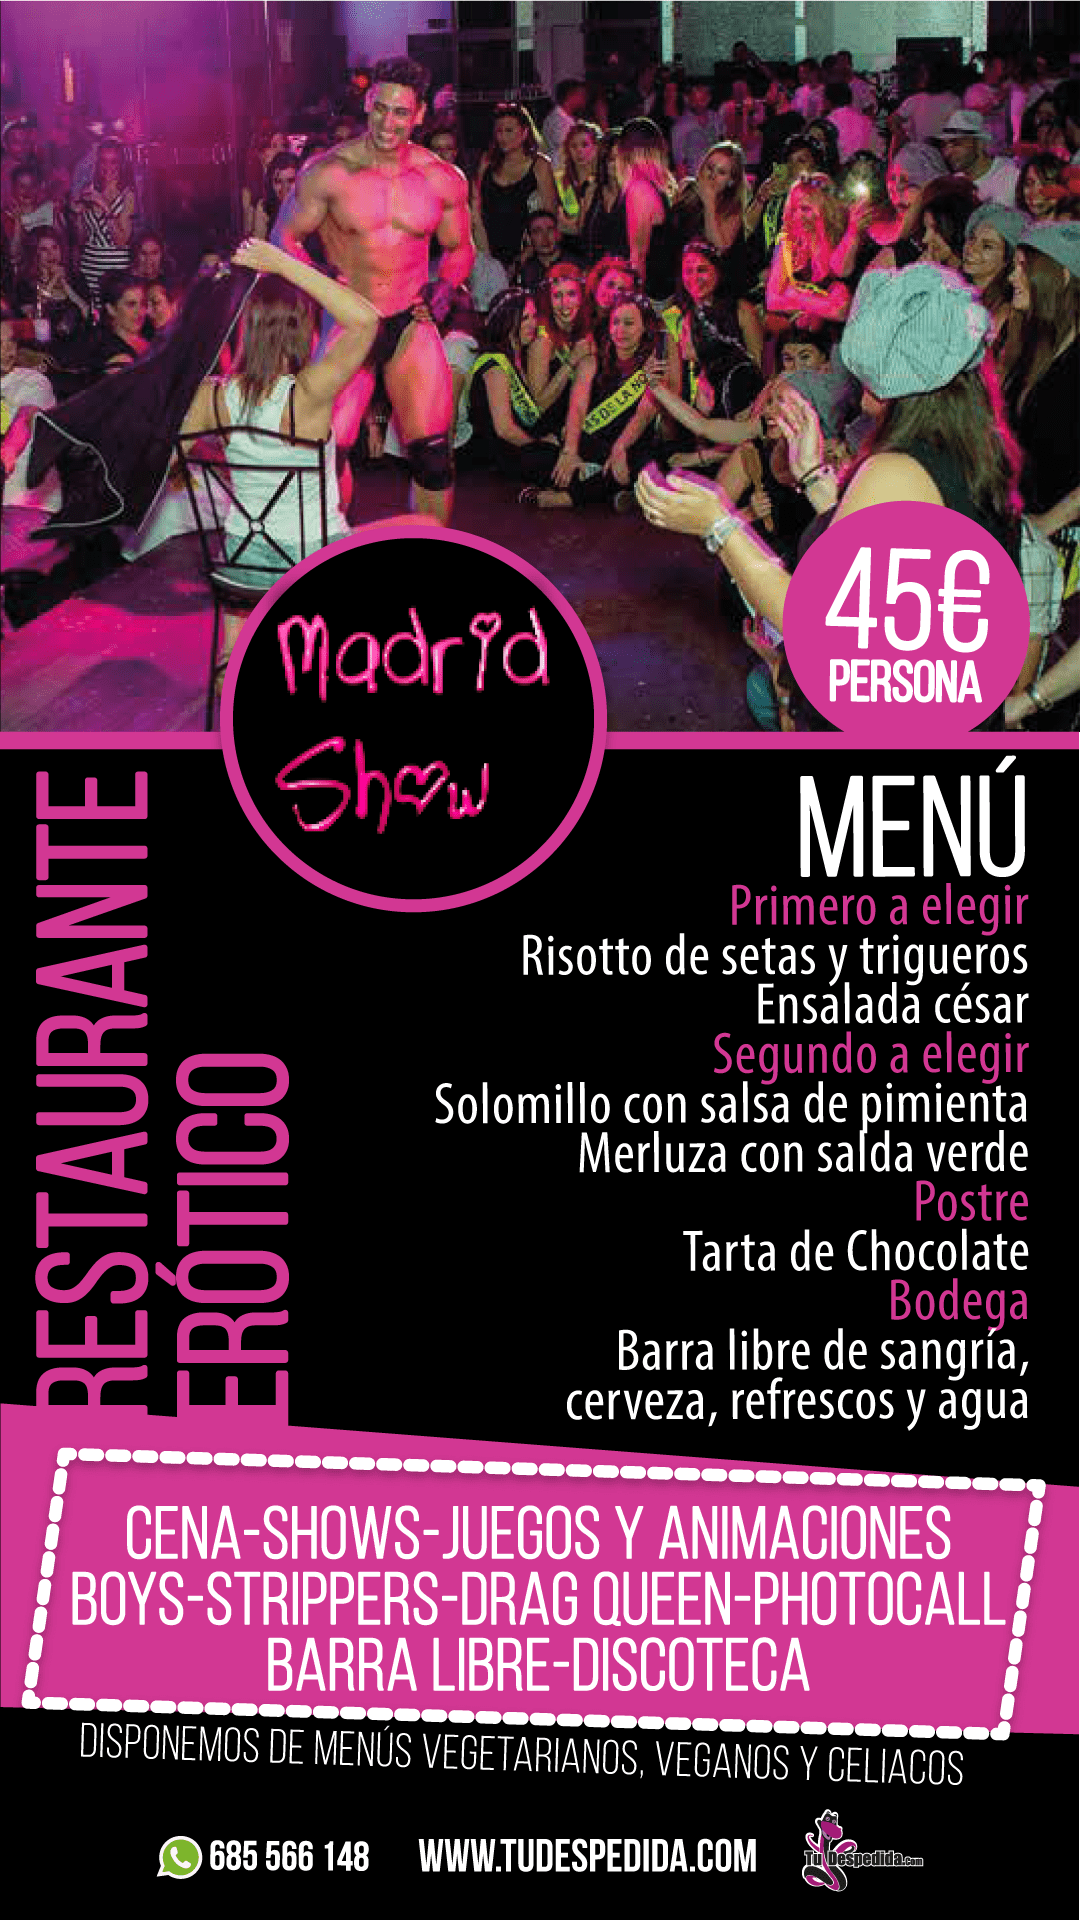 RTE MADRID SHOW